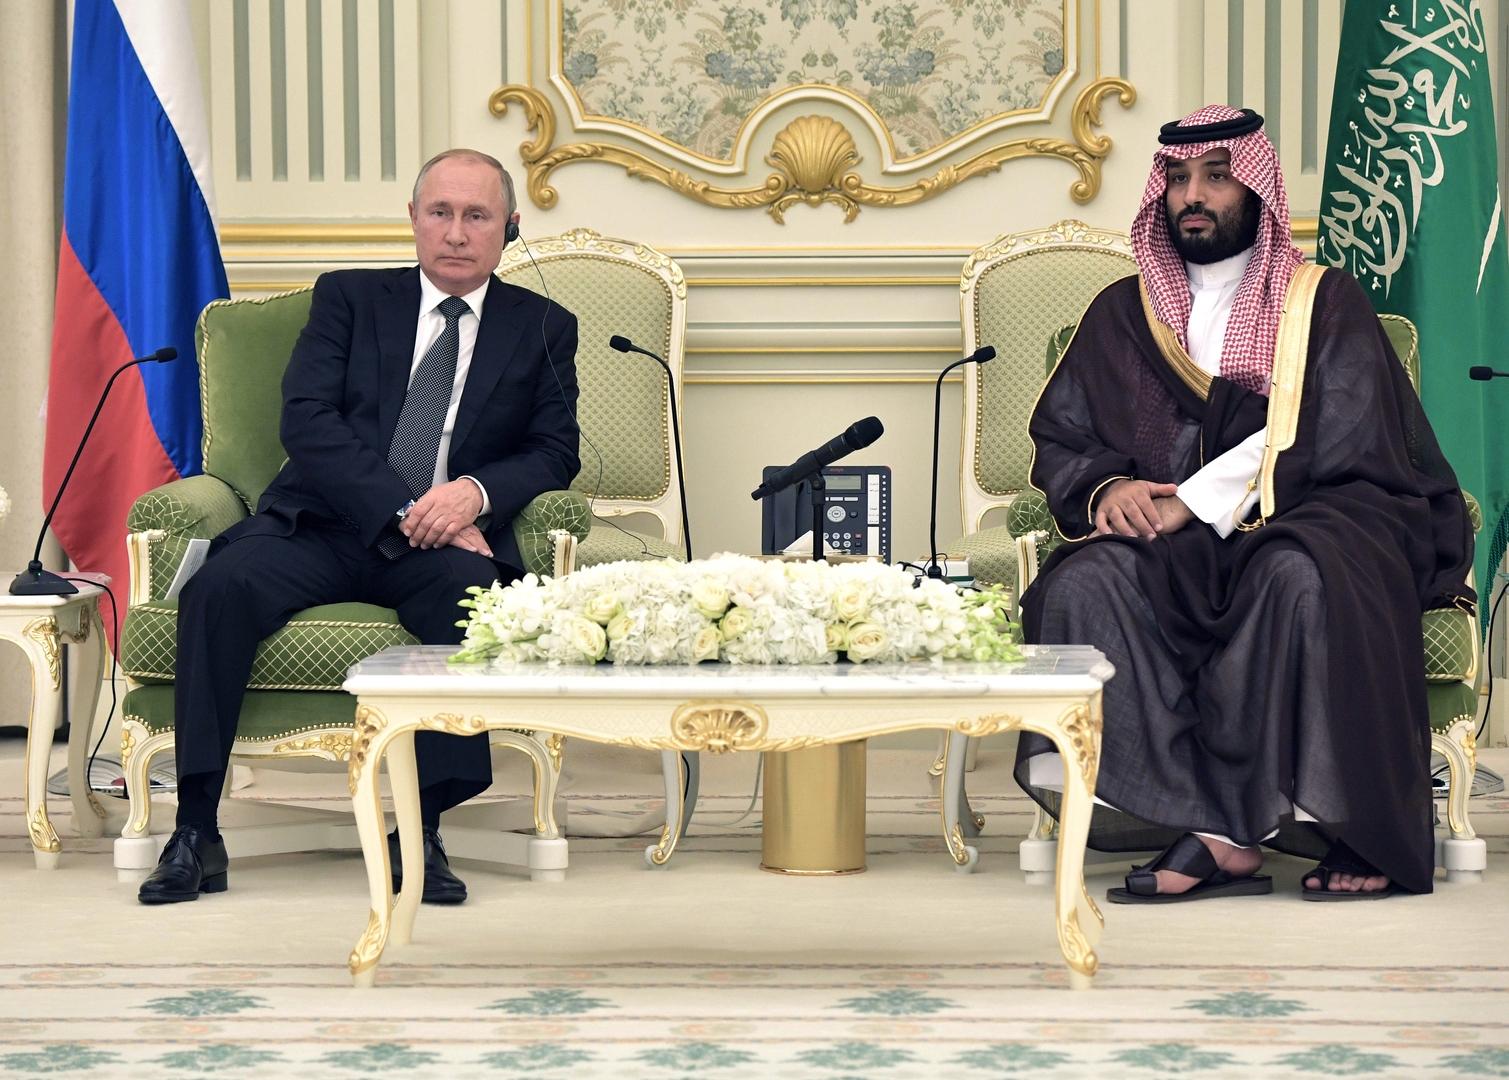 بوتين وبن سلمان يبحثان صفقة